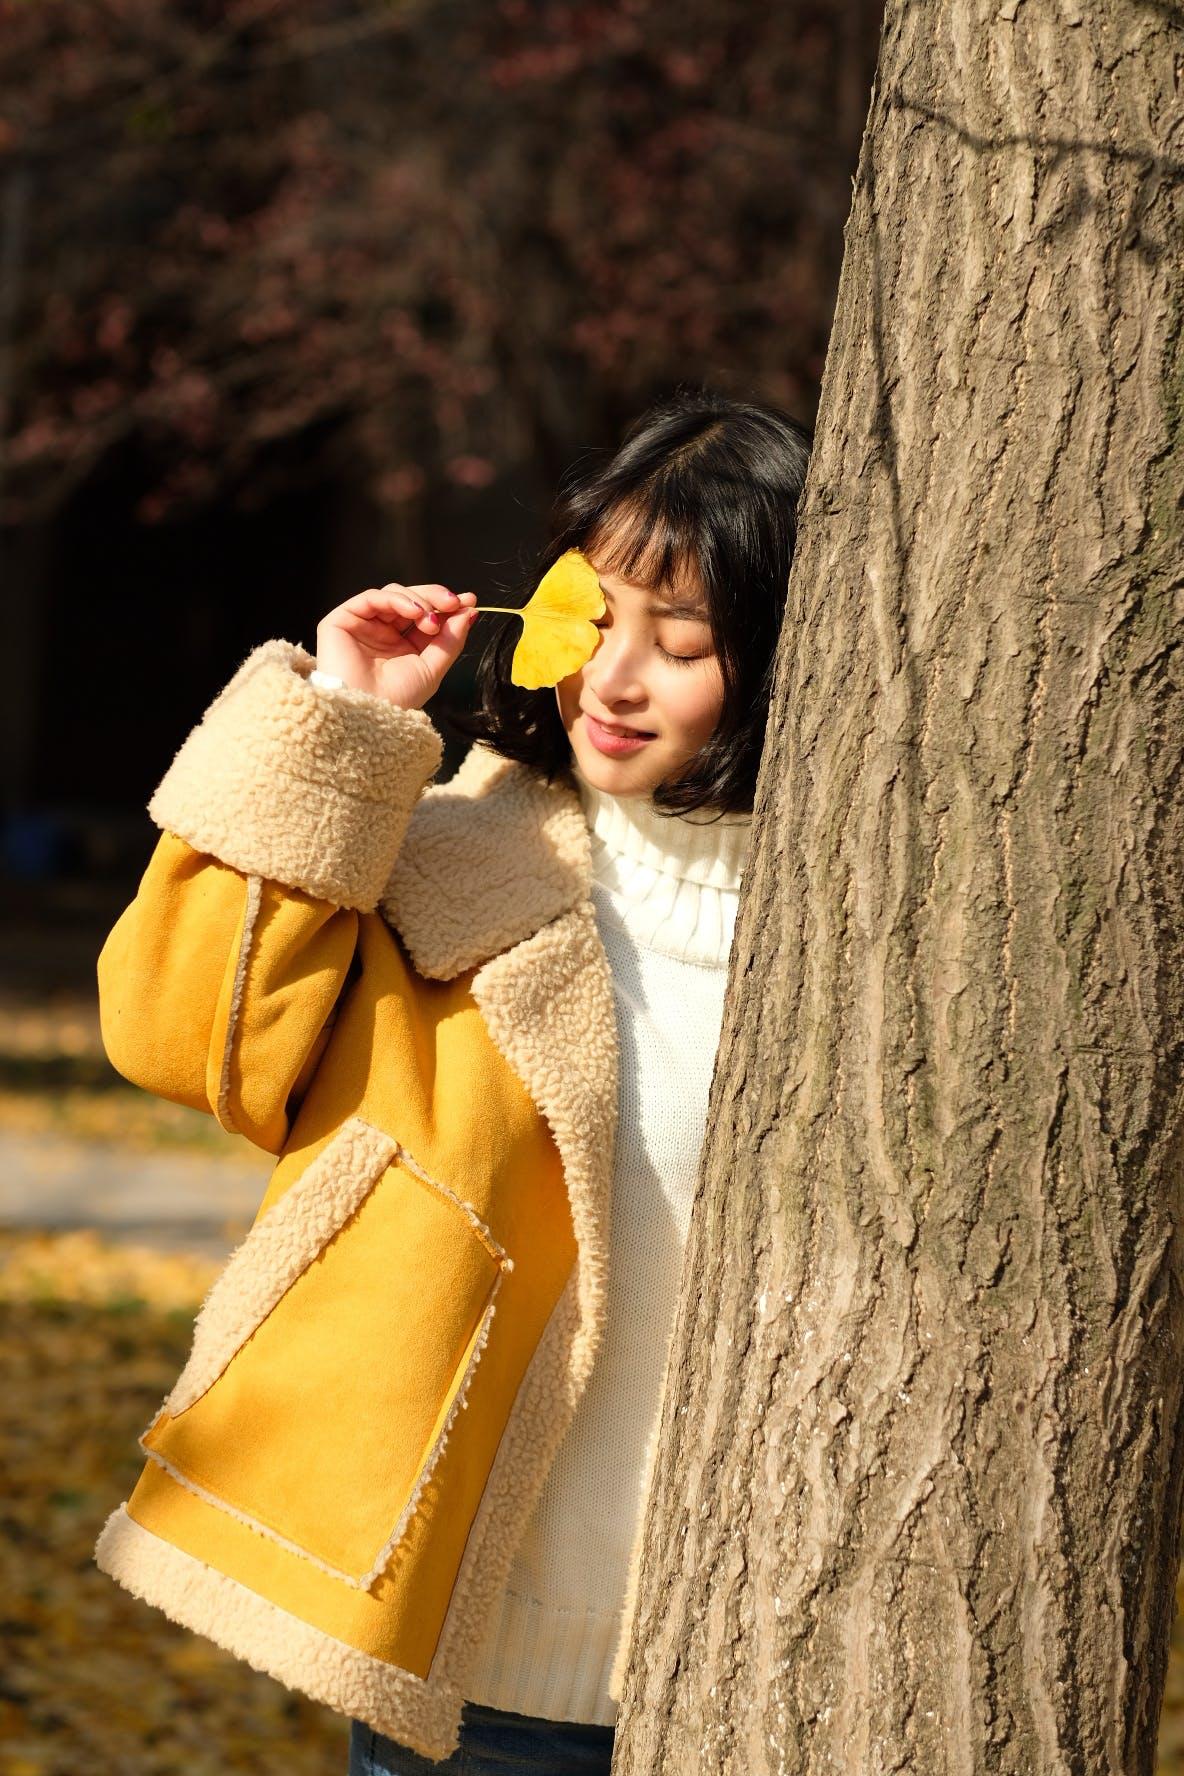 Woman Wearing Yellow Jacket Holding Yellow Leaf